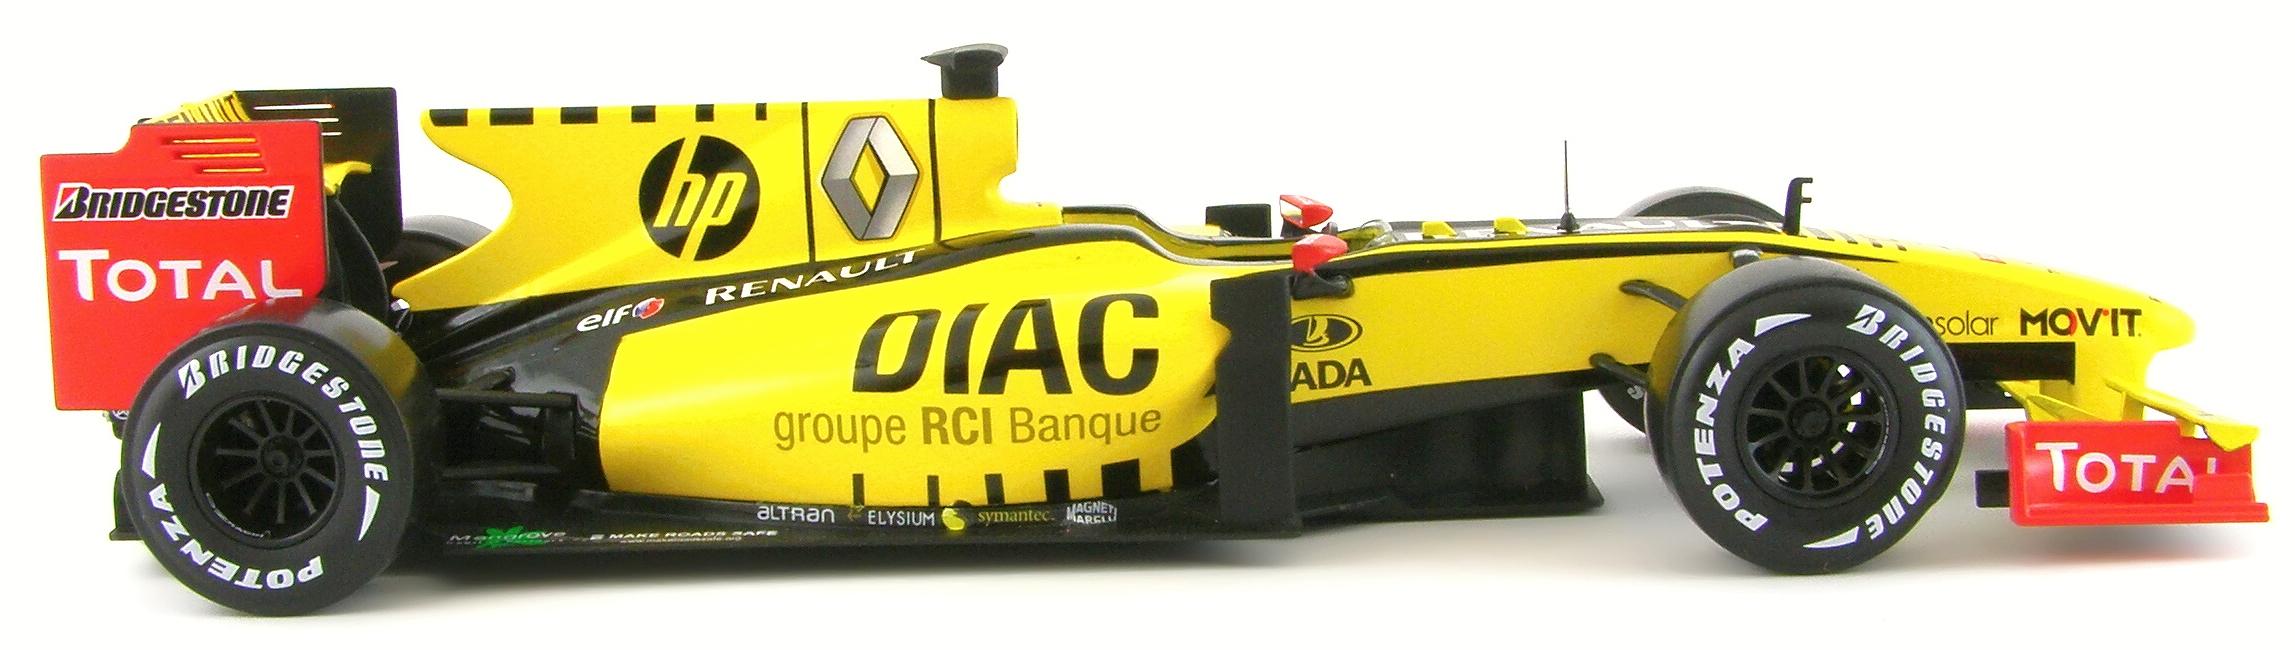 Renault_F1_R30_2010_Norev_185121_side_p.jpg